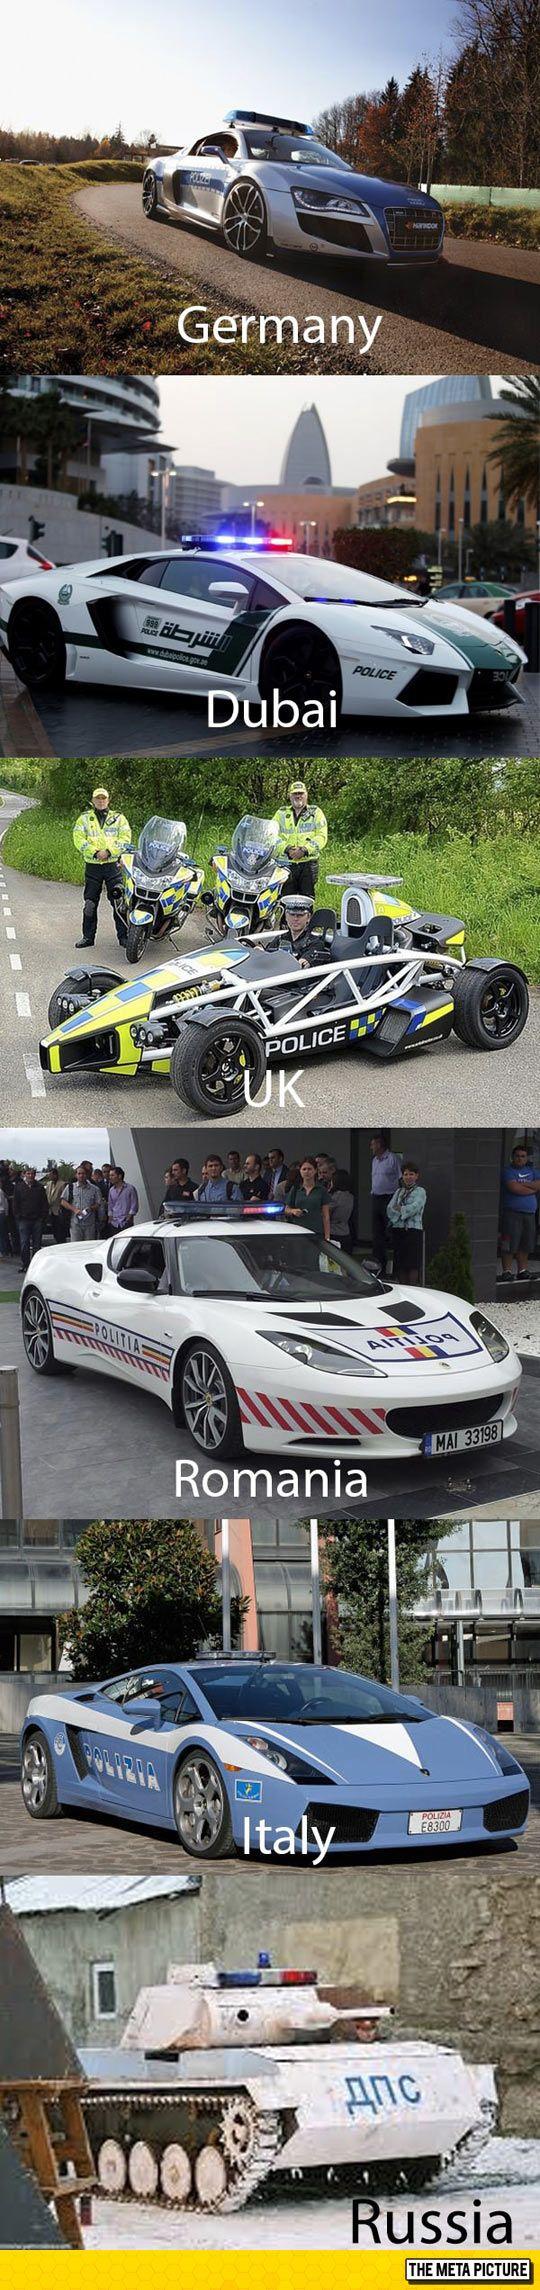 Cop Cars Around The World